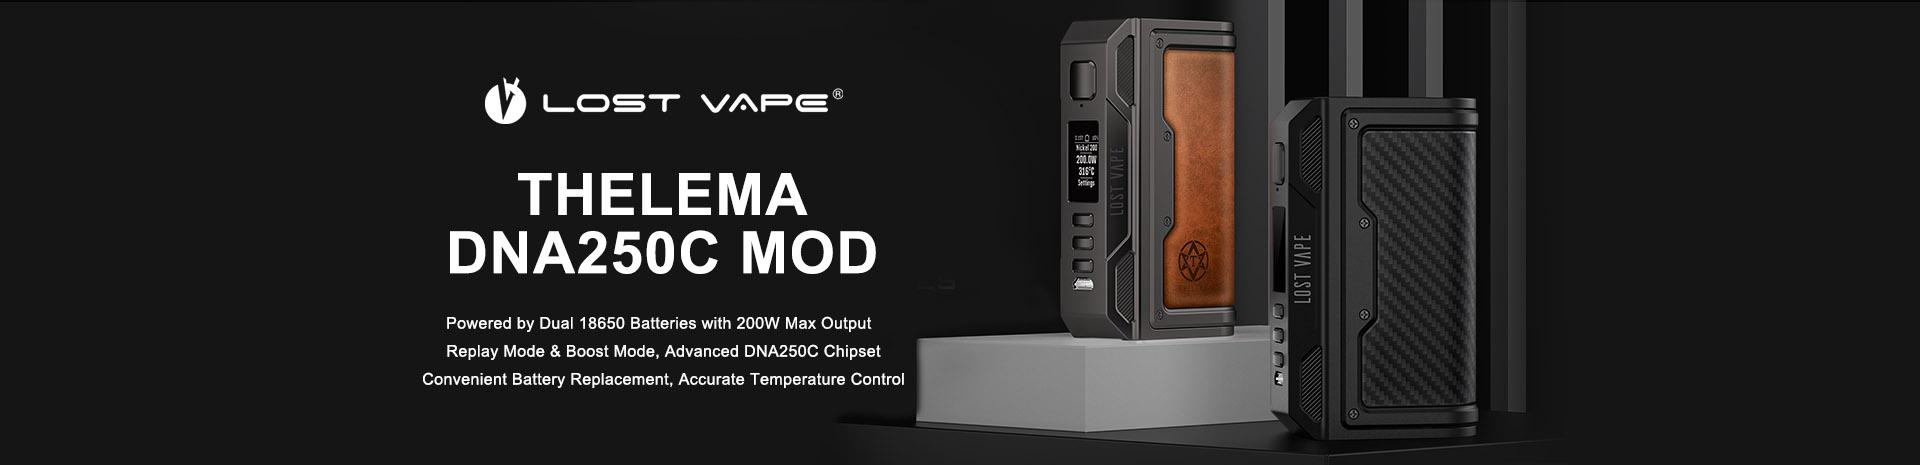 Lost Vape Thelema DNA250C Box Mod Banner